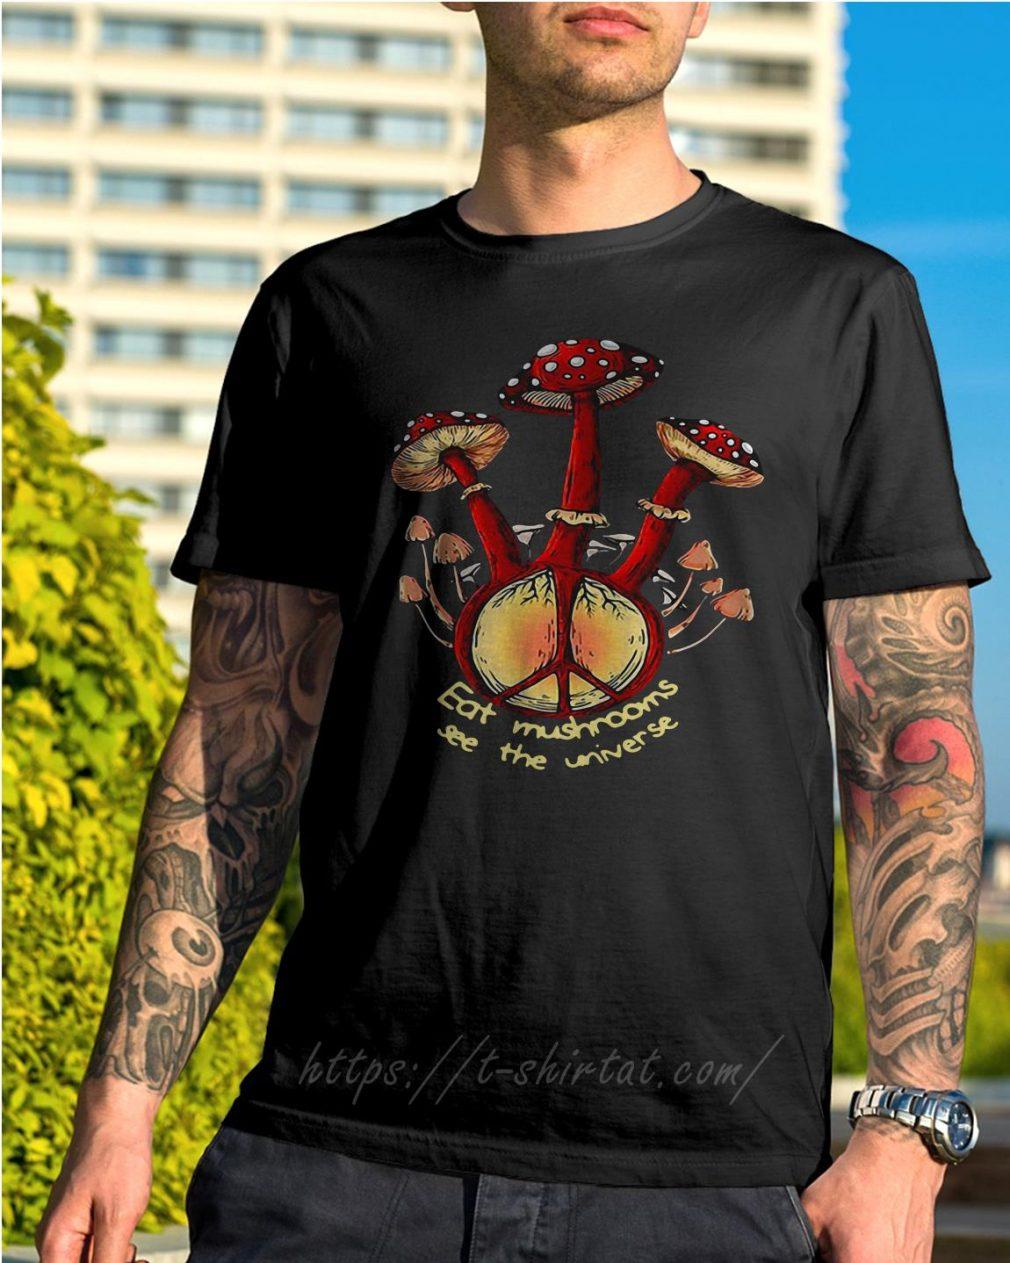 Hippie eat mushrooms see the universe shirt